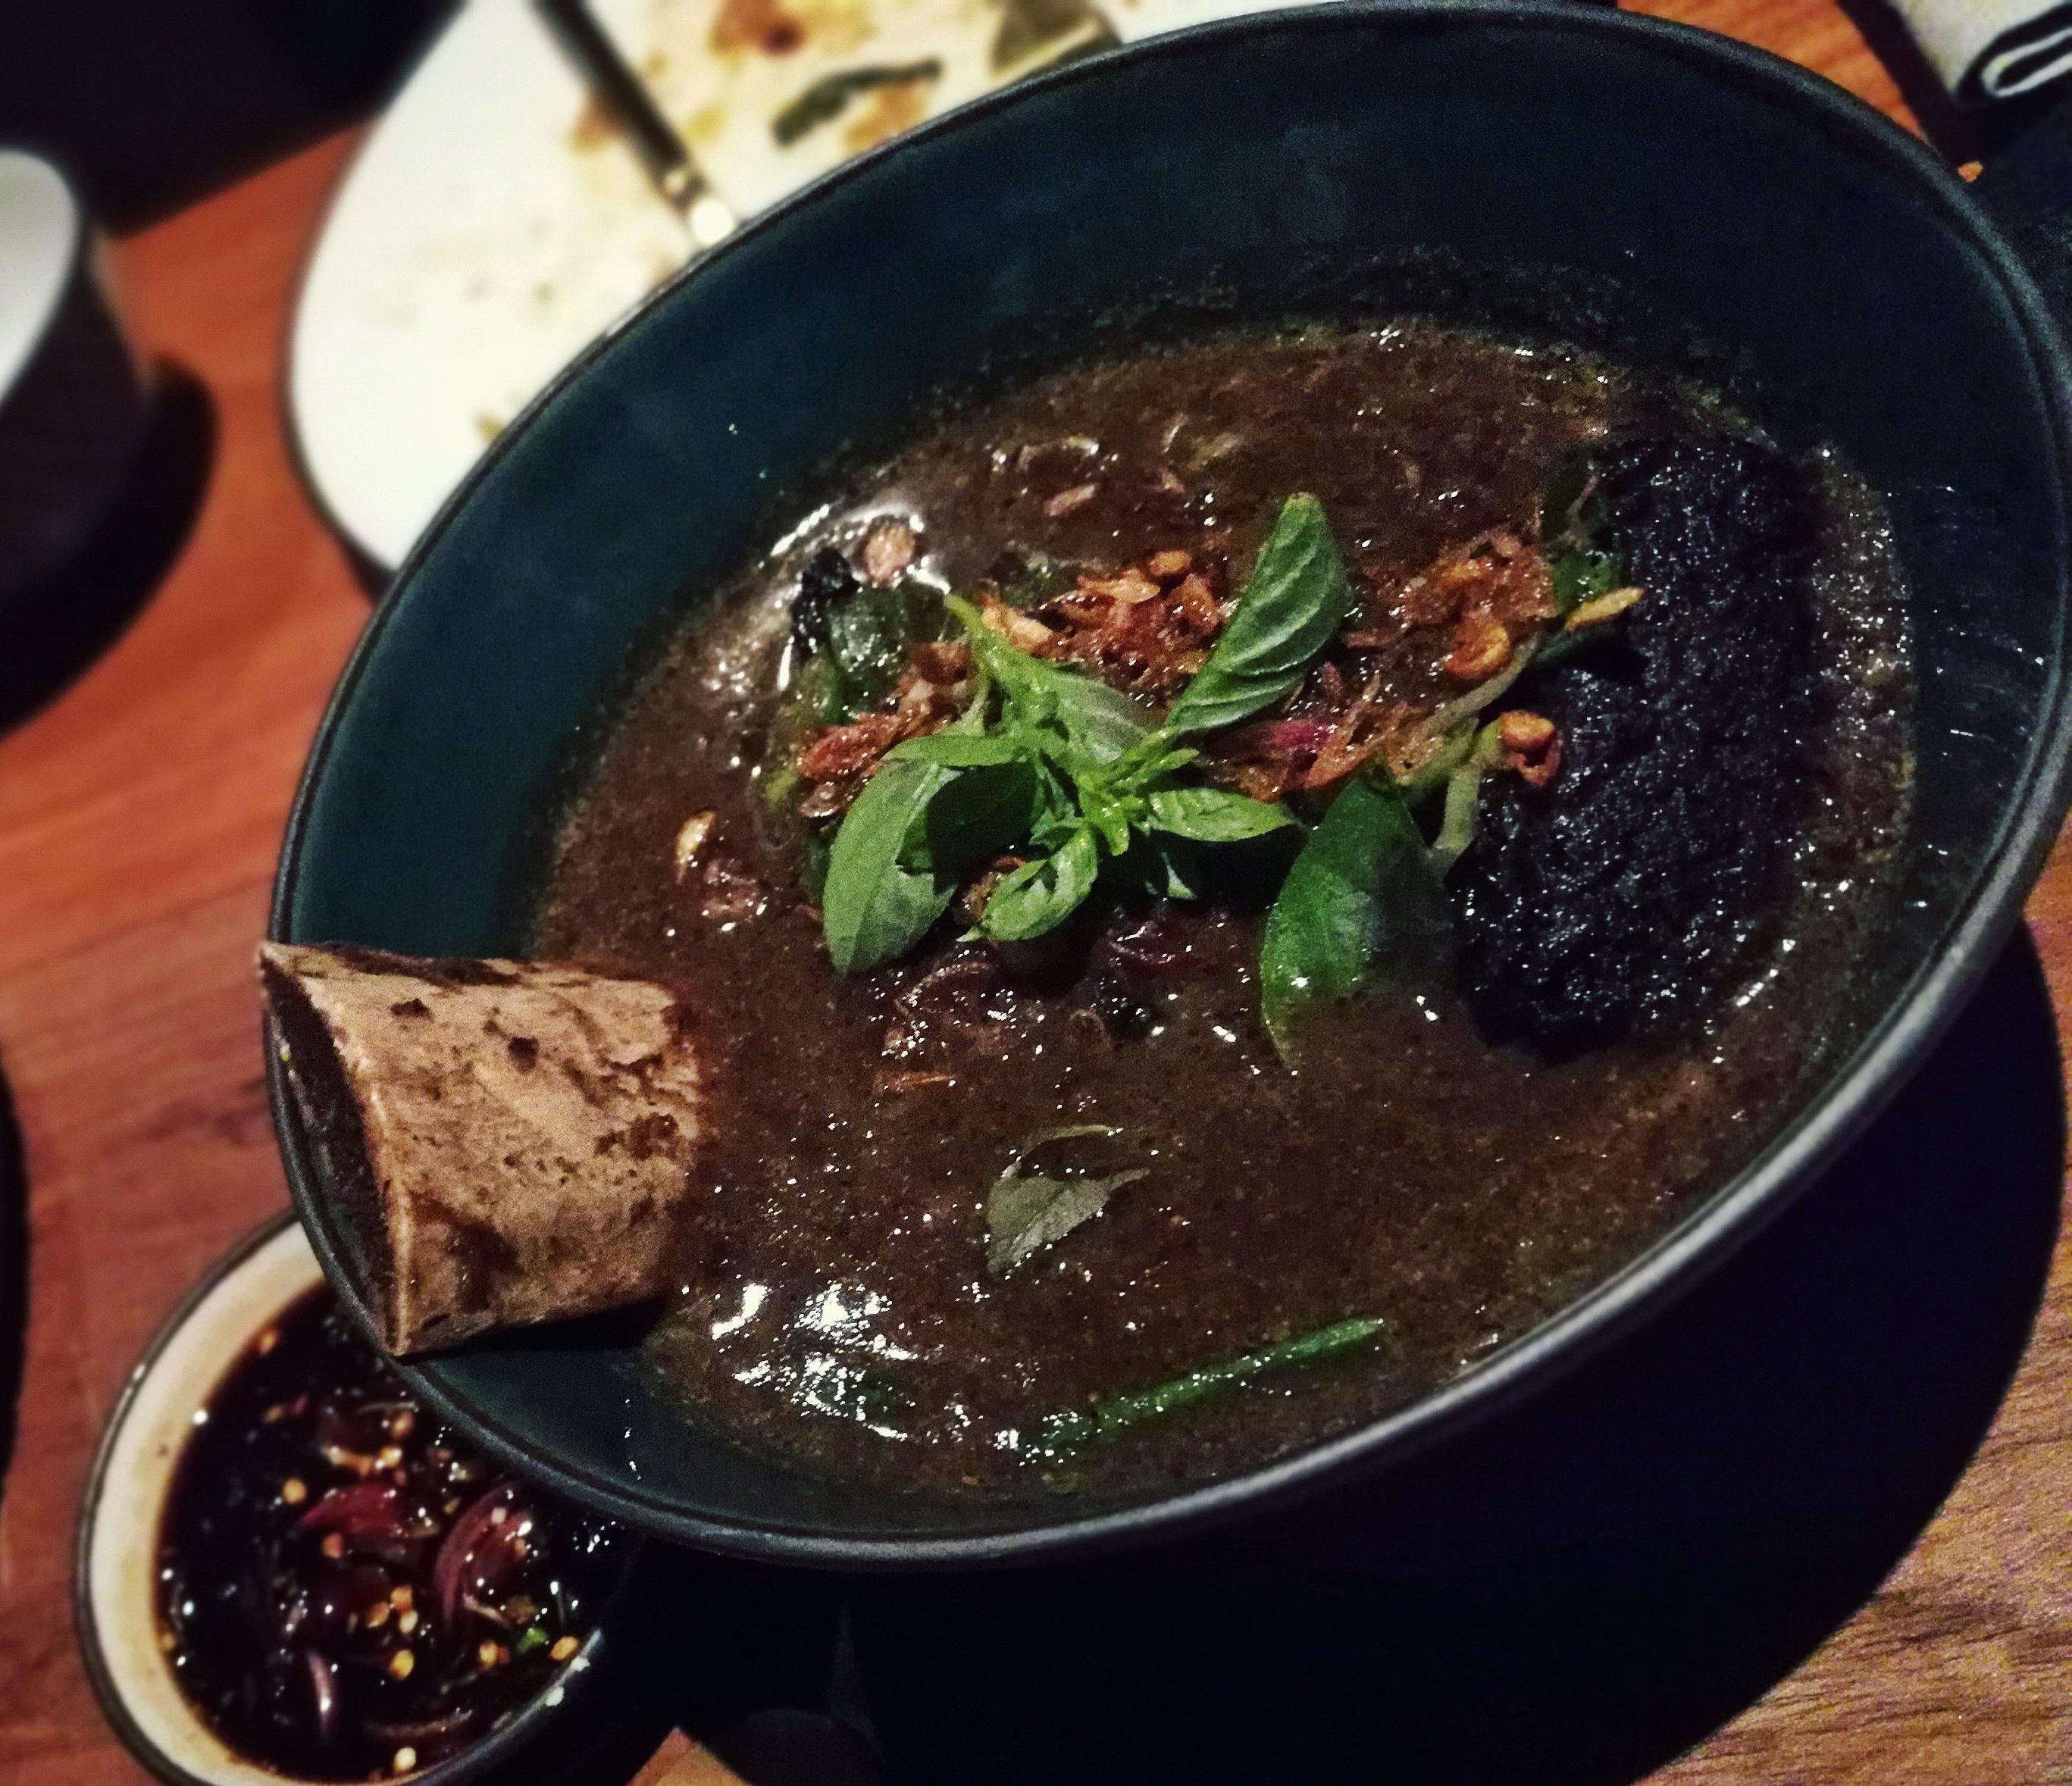 soto konro makasar, a sűrű húsos leves Sulawesiről